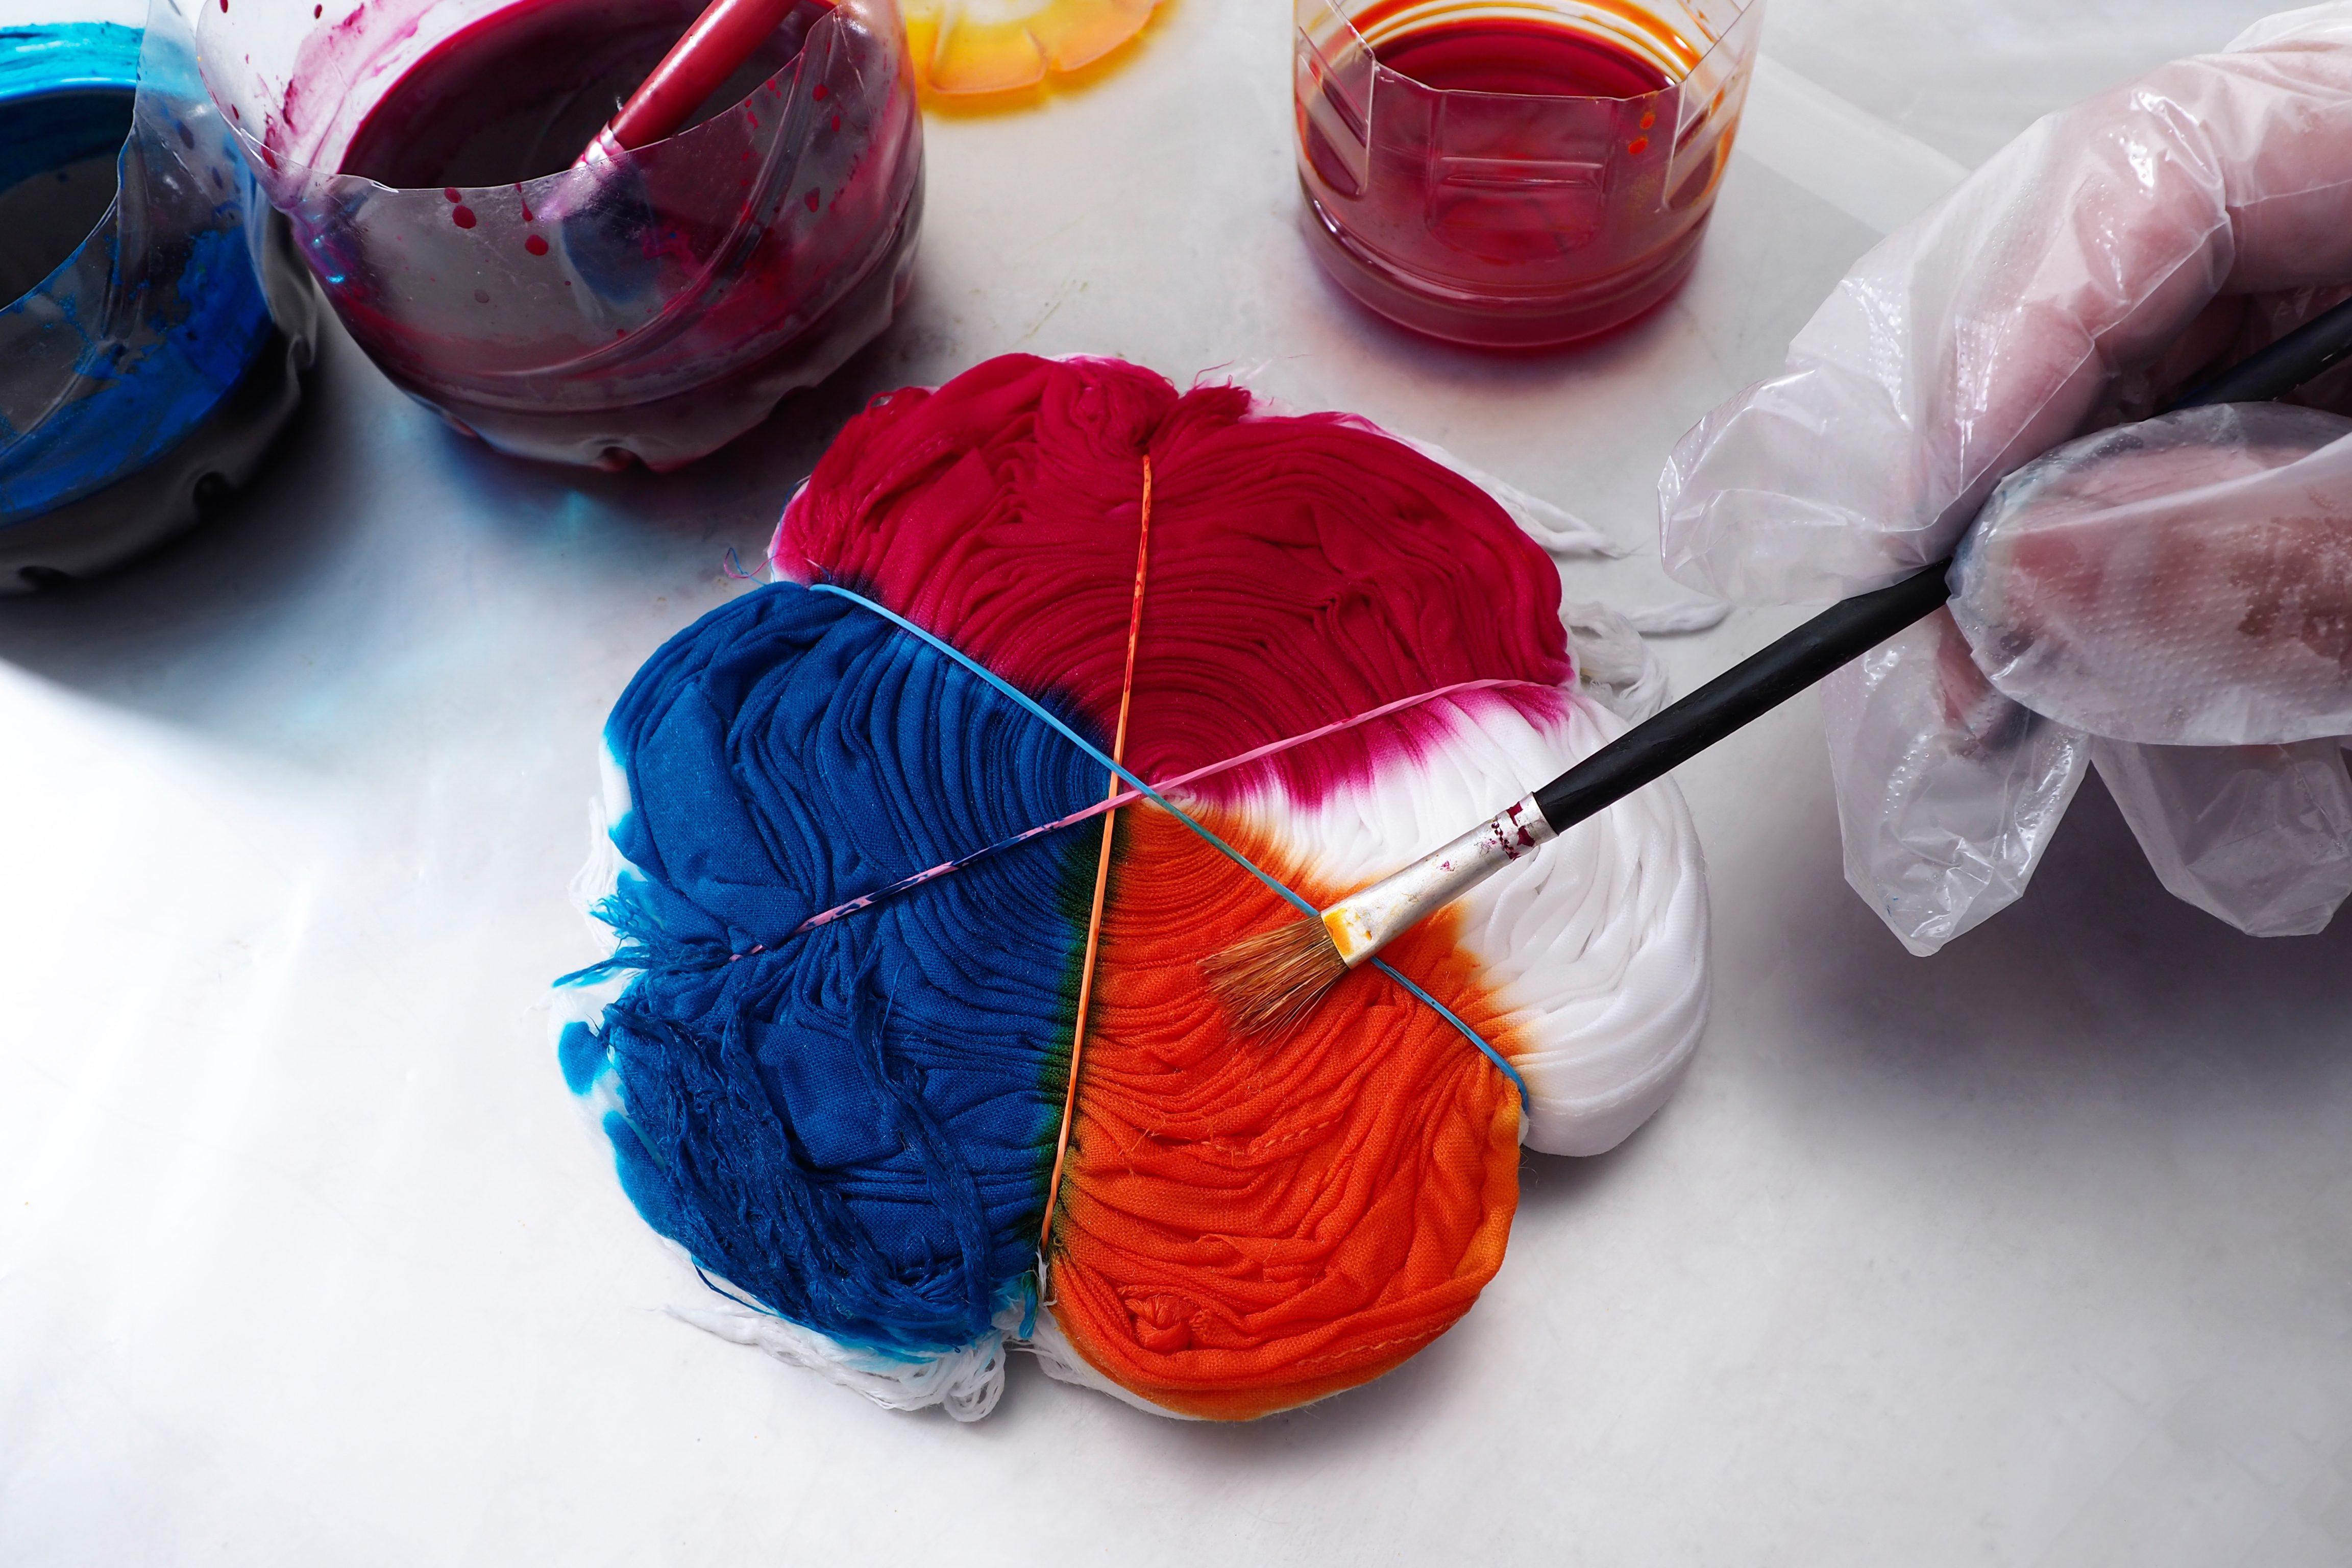 Fabric Tie-dye.